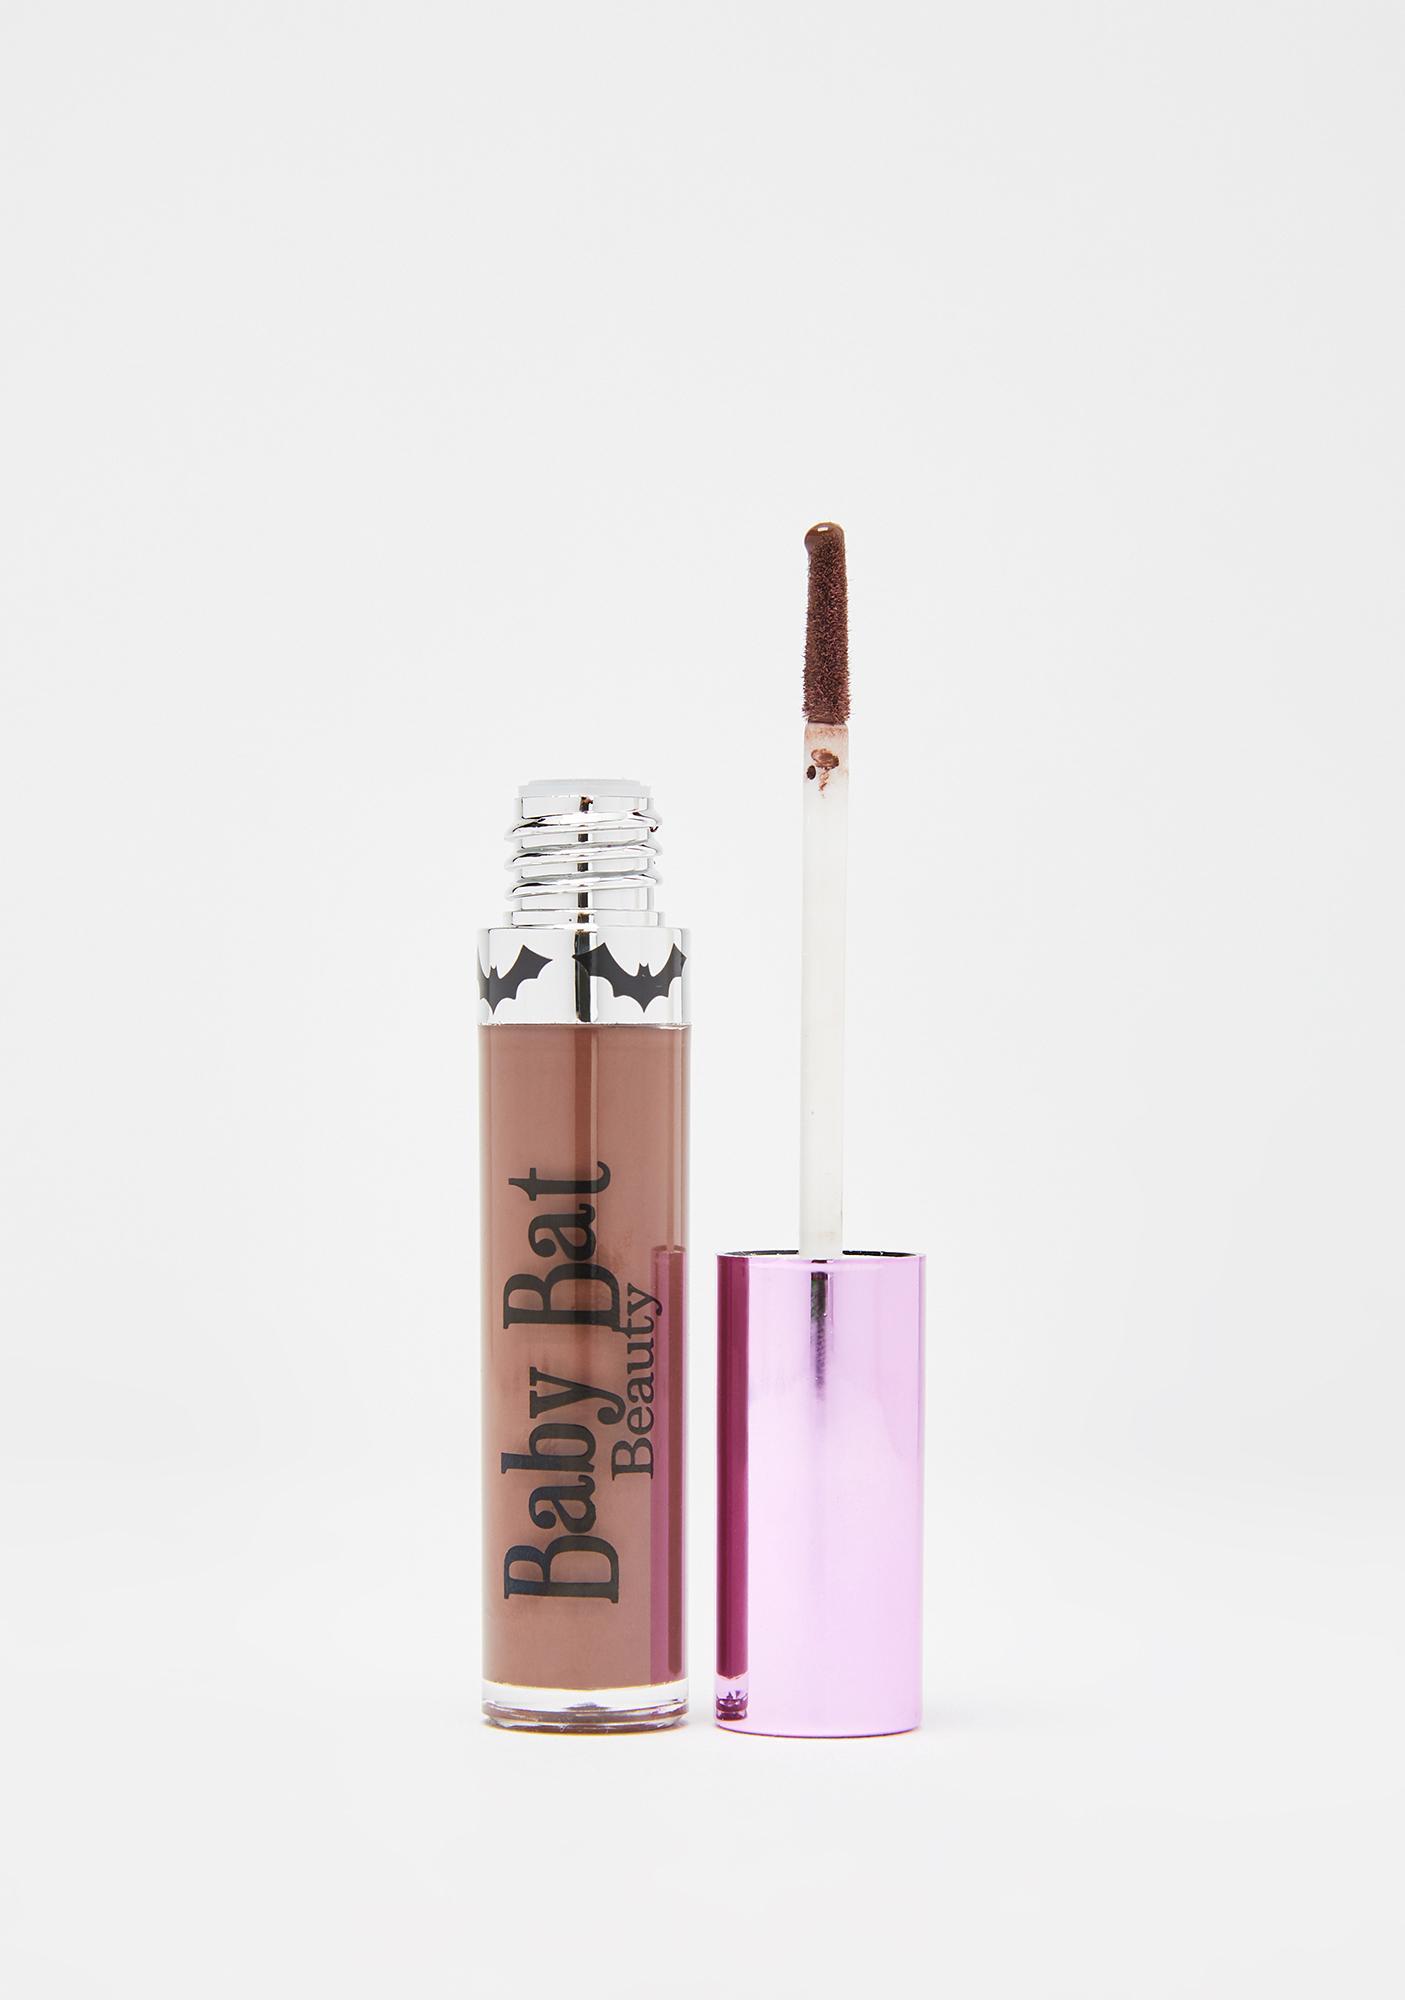 Baby Bat Beauty Insomnia Matte Liquid Lipstick